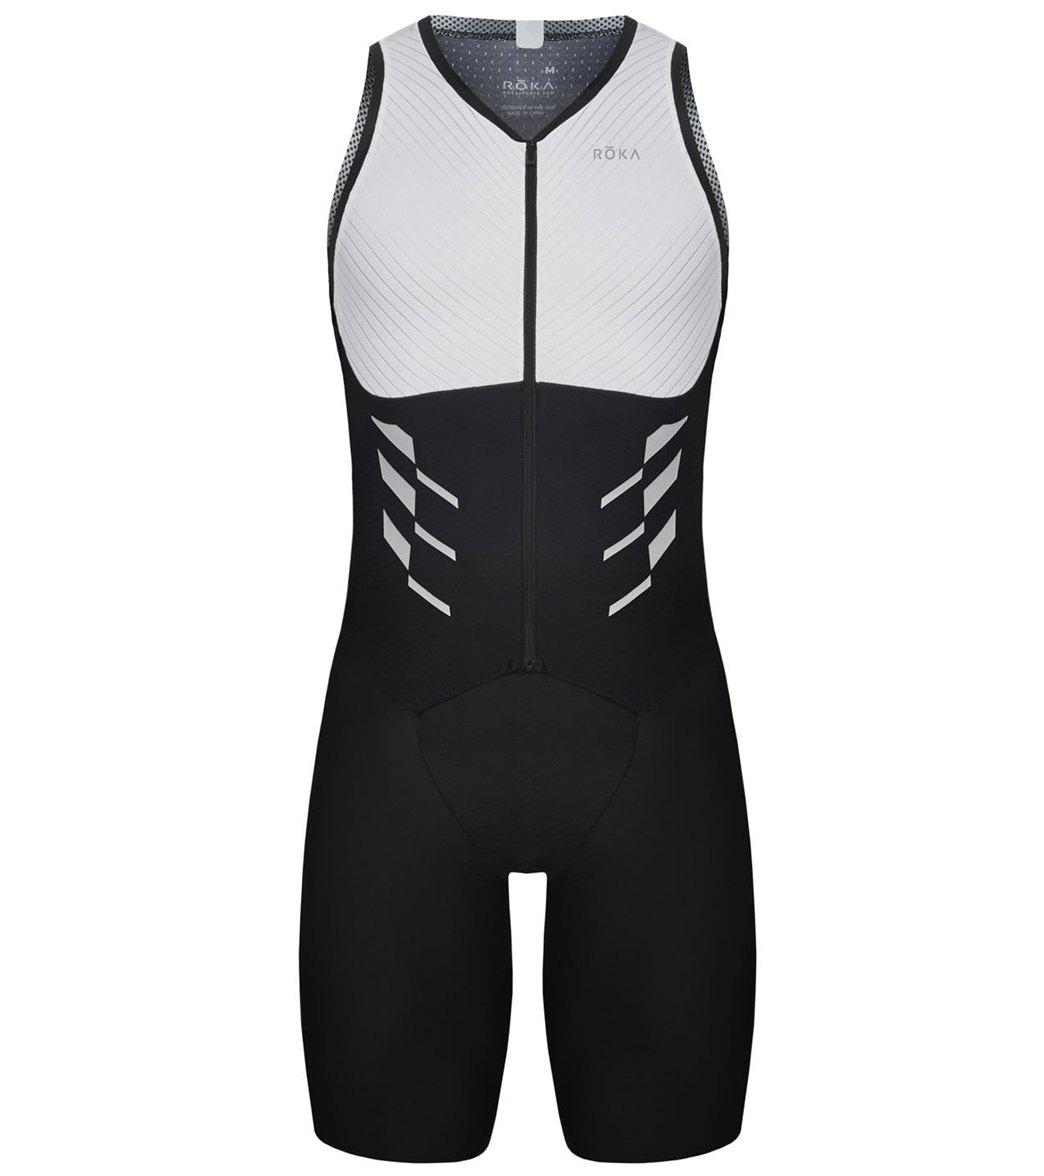 93400be95f3 ROKA Men s Elite Aero II Sleeveless Tri Suit at SwimOutlet.com - Free  Shipping